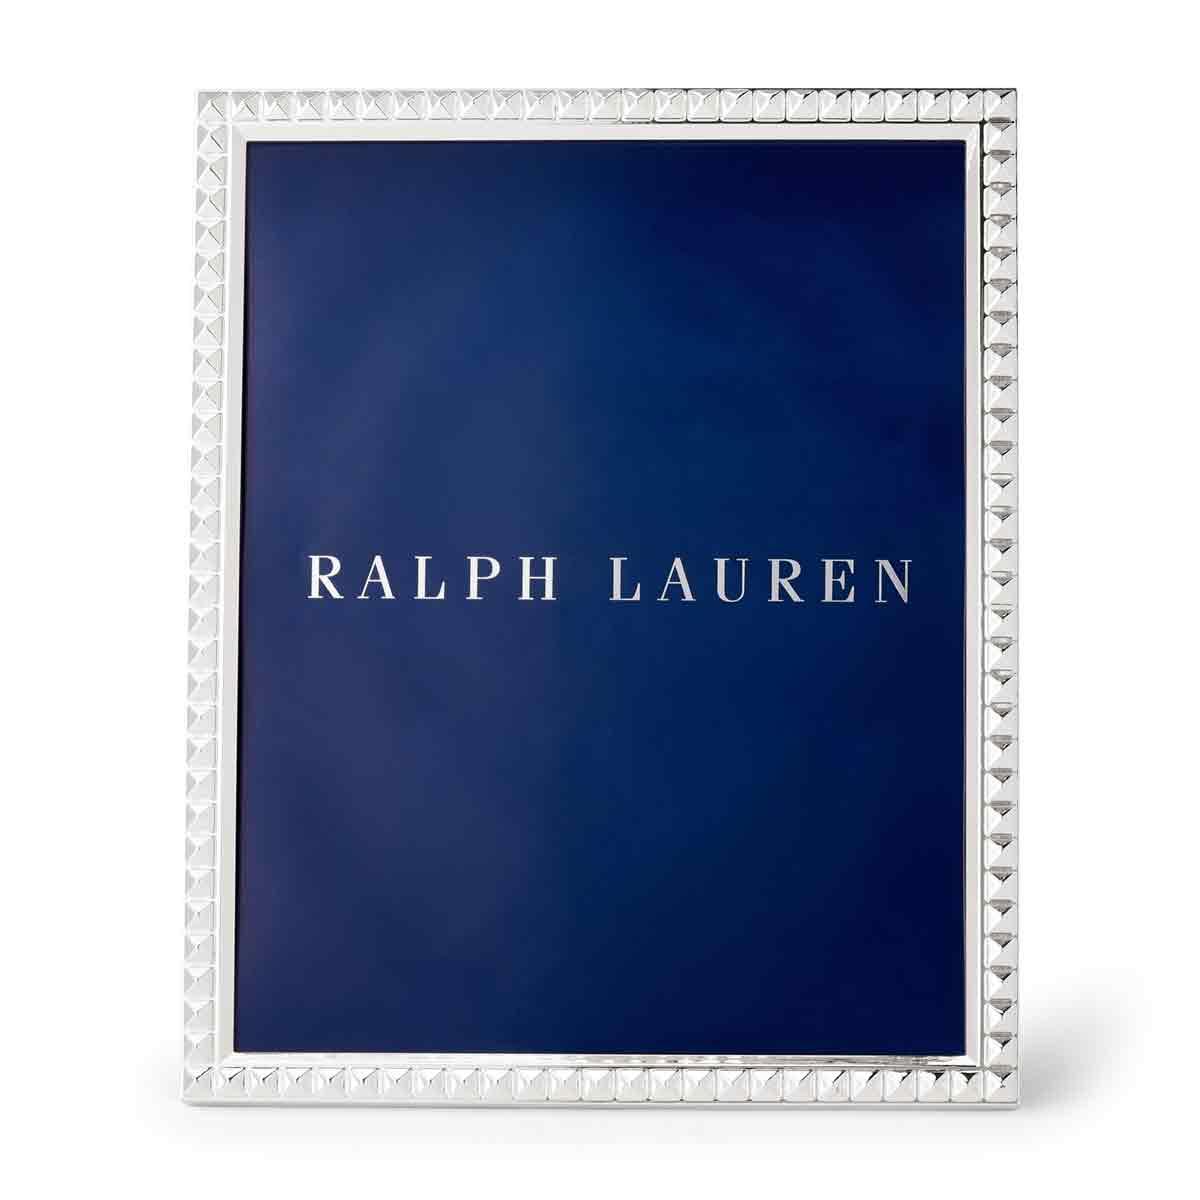 "Ralph Lauren Raina 8x10"" Frame, Silver"